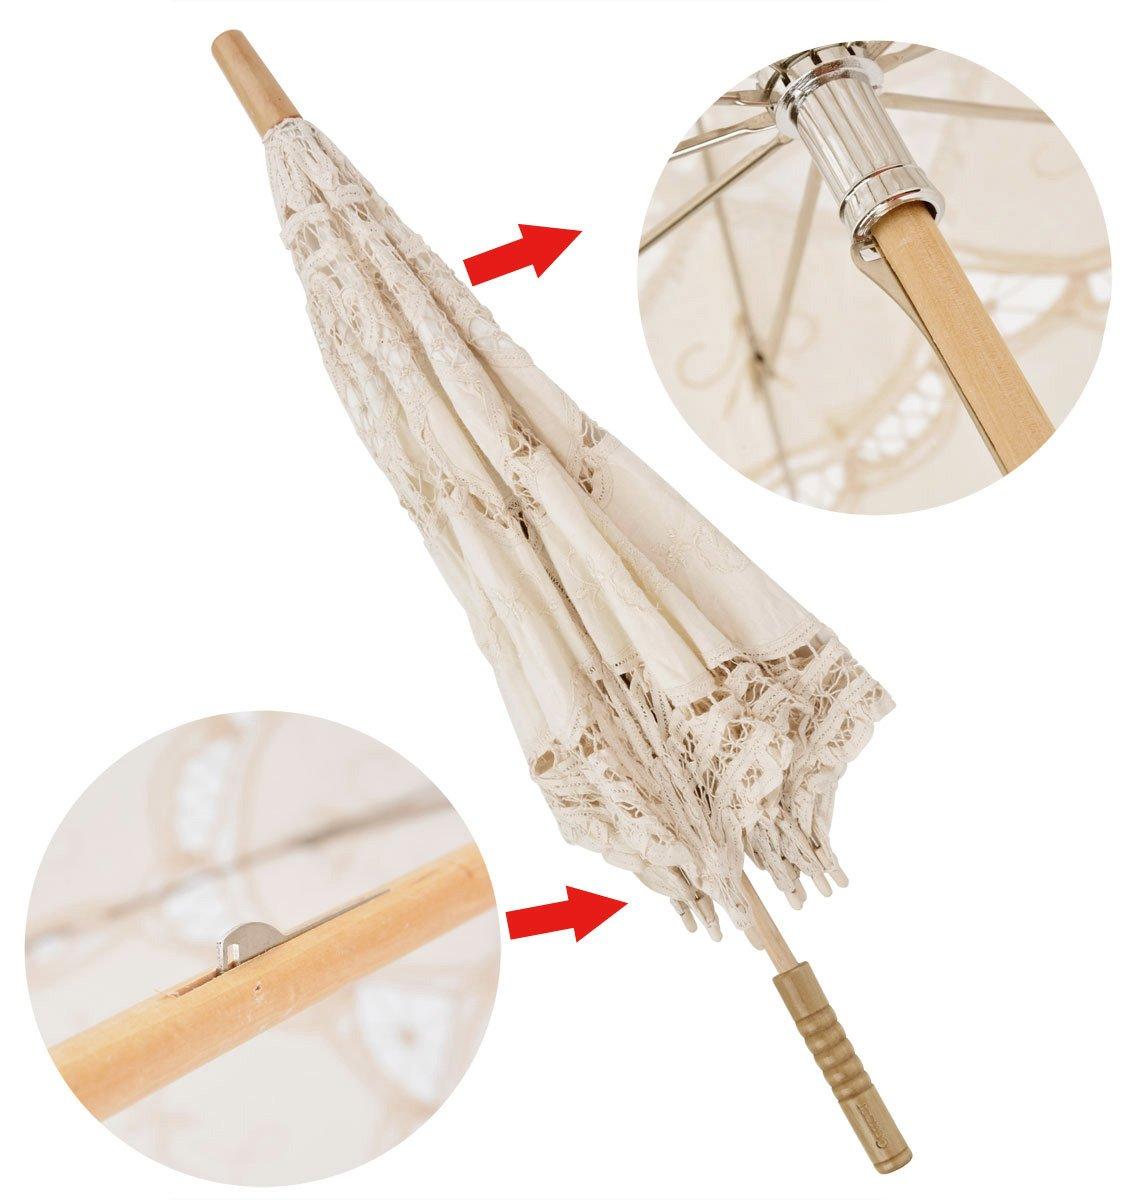 Leegoal Handmade Umbrellas for Bridal Bridesmaid Wedding Decoration, Beige 6